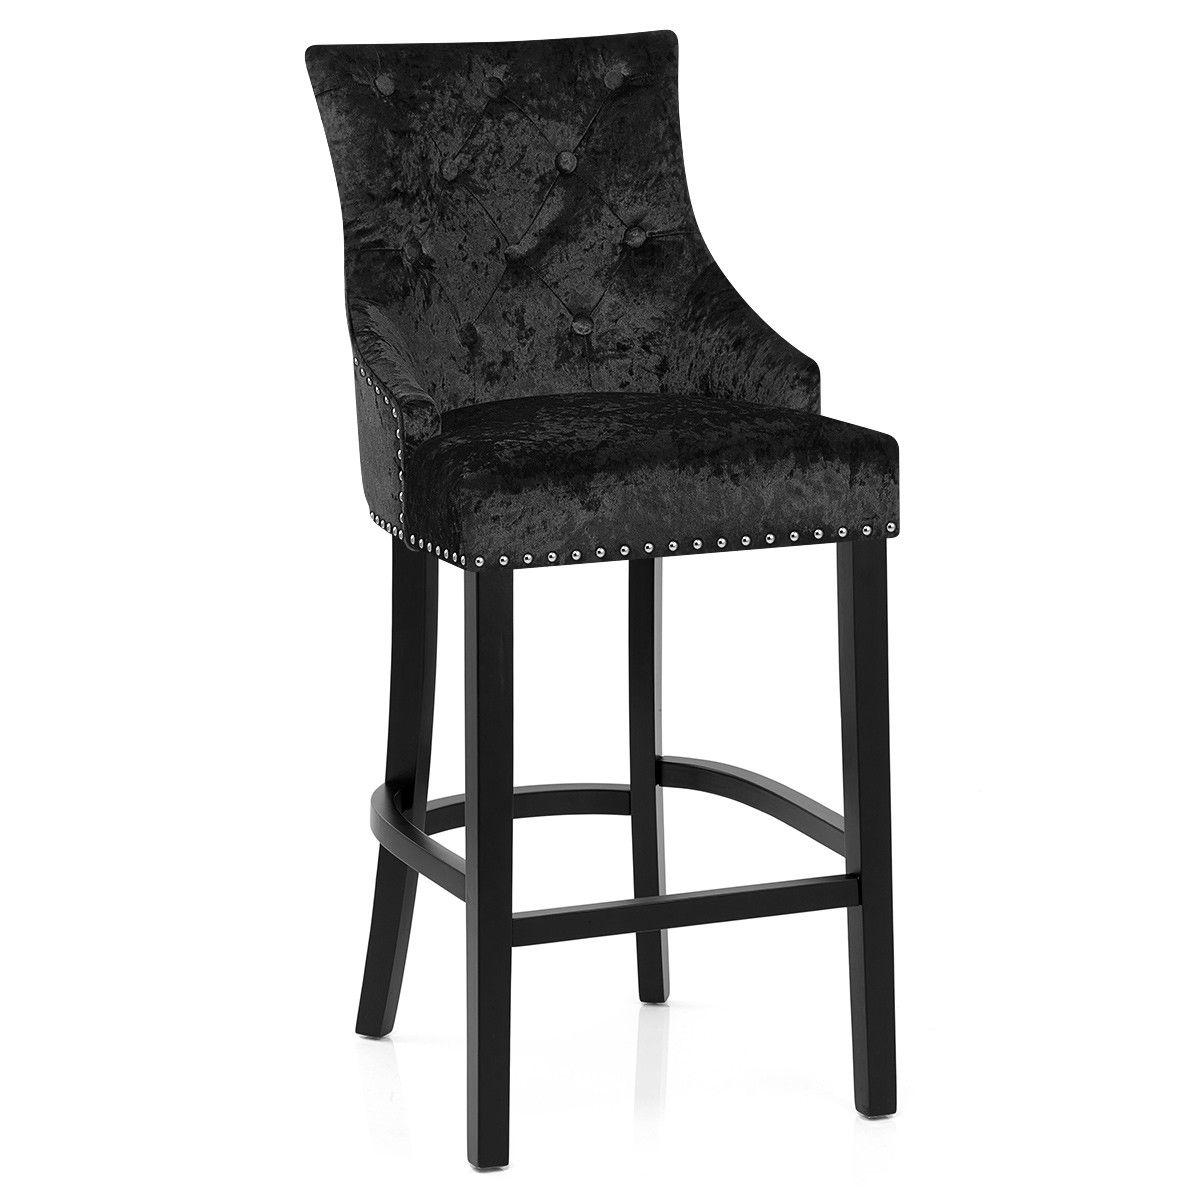 Ascot Bar Stool Black Velvet Atlantic Shopping Bar Stools Kitchen Bar Stools Outdoor Furniture Chairs